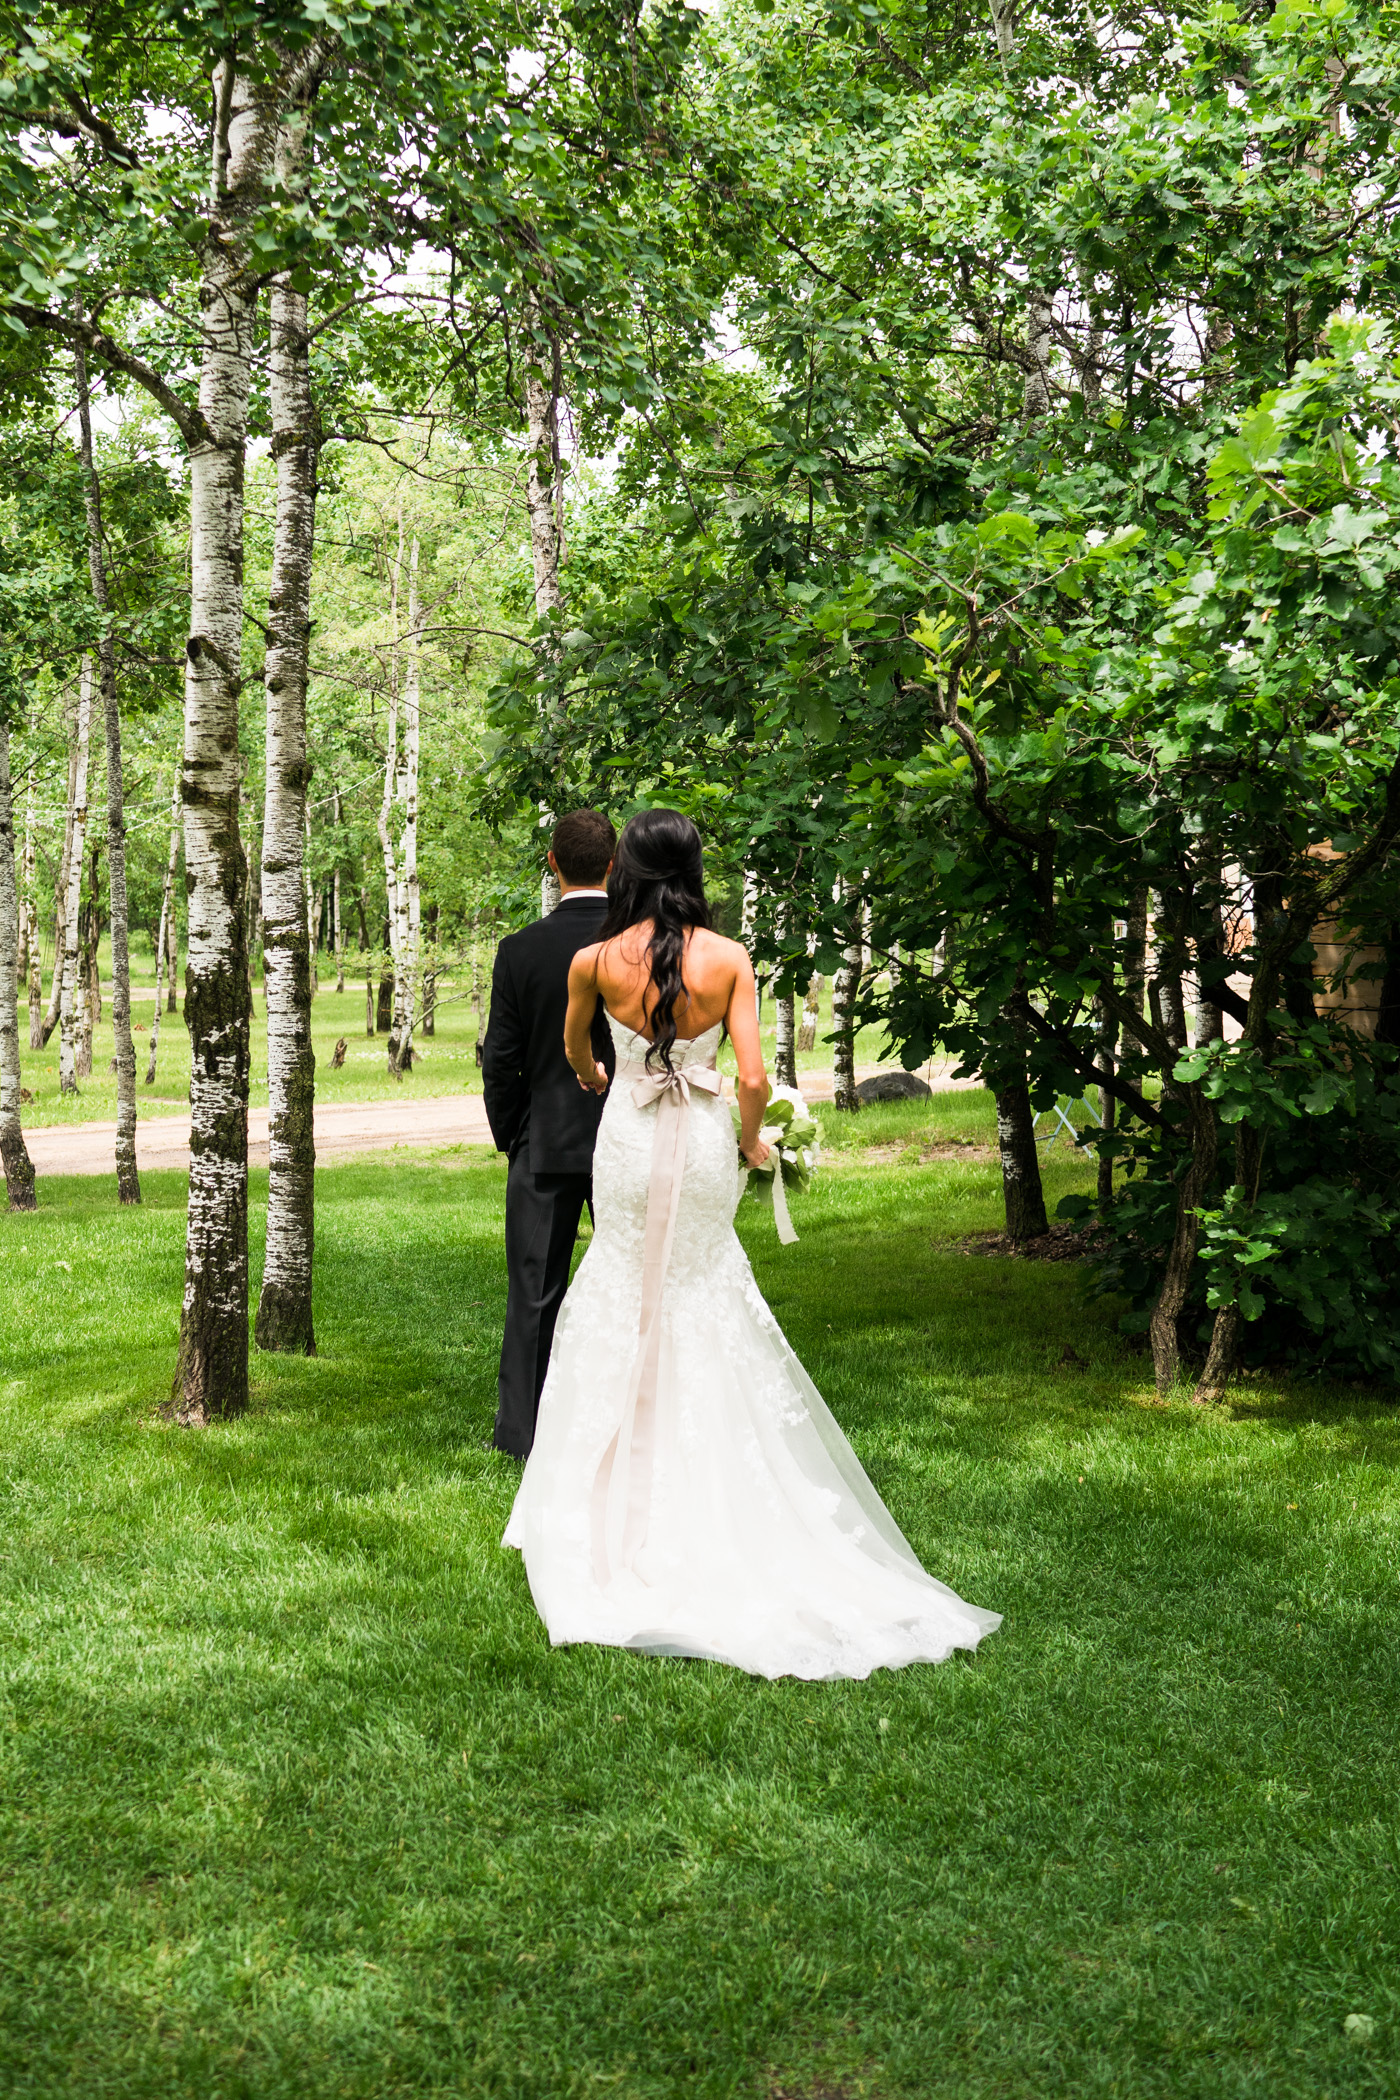 Hillary and Mark - Pineridge Hollow Wedding - Cojo Photo-253.jpg